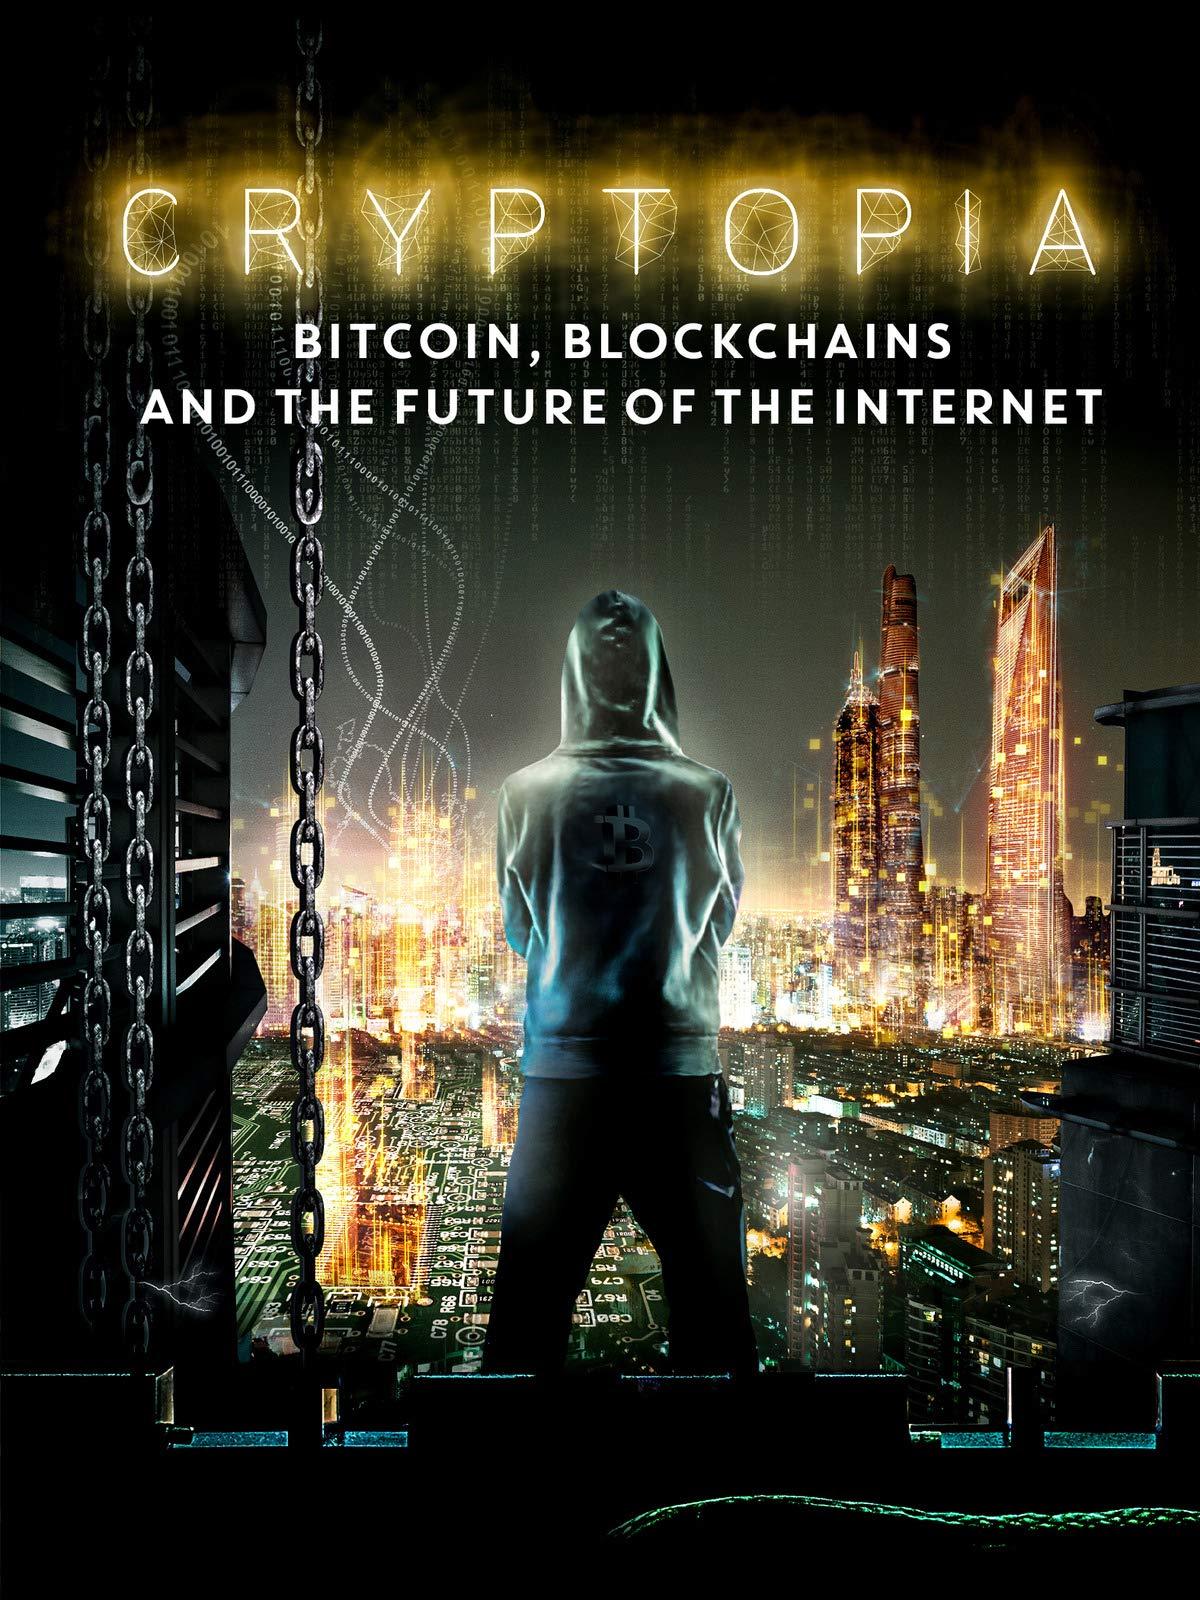 Blockchain Bitcoin Ethereum Ripple s trsai Distributed ledger